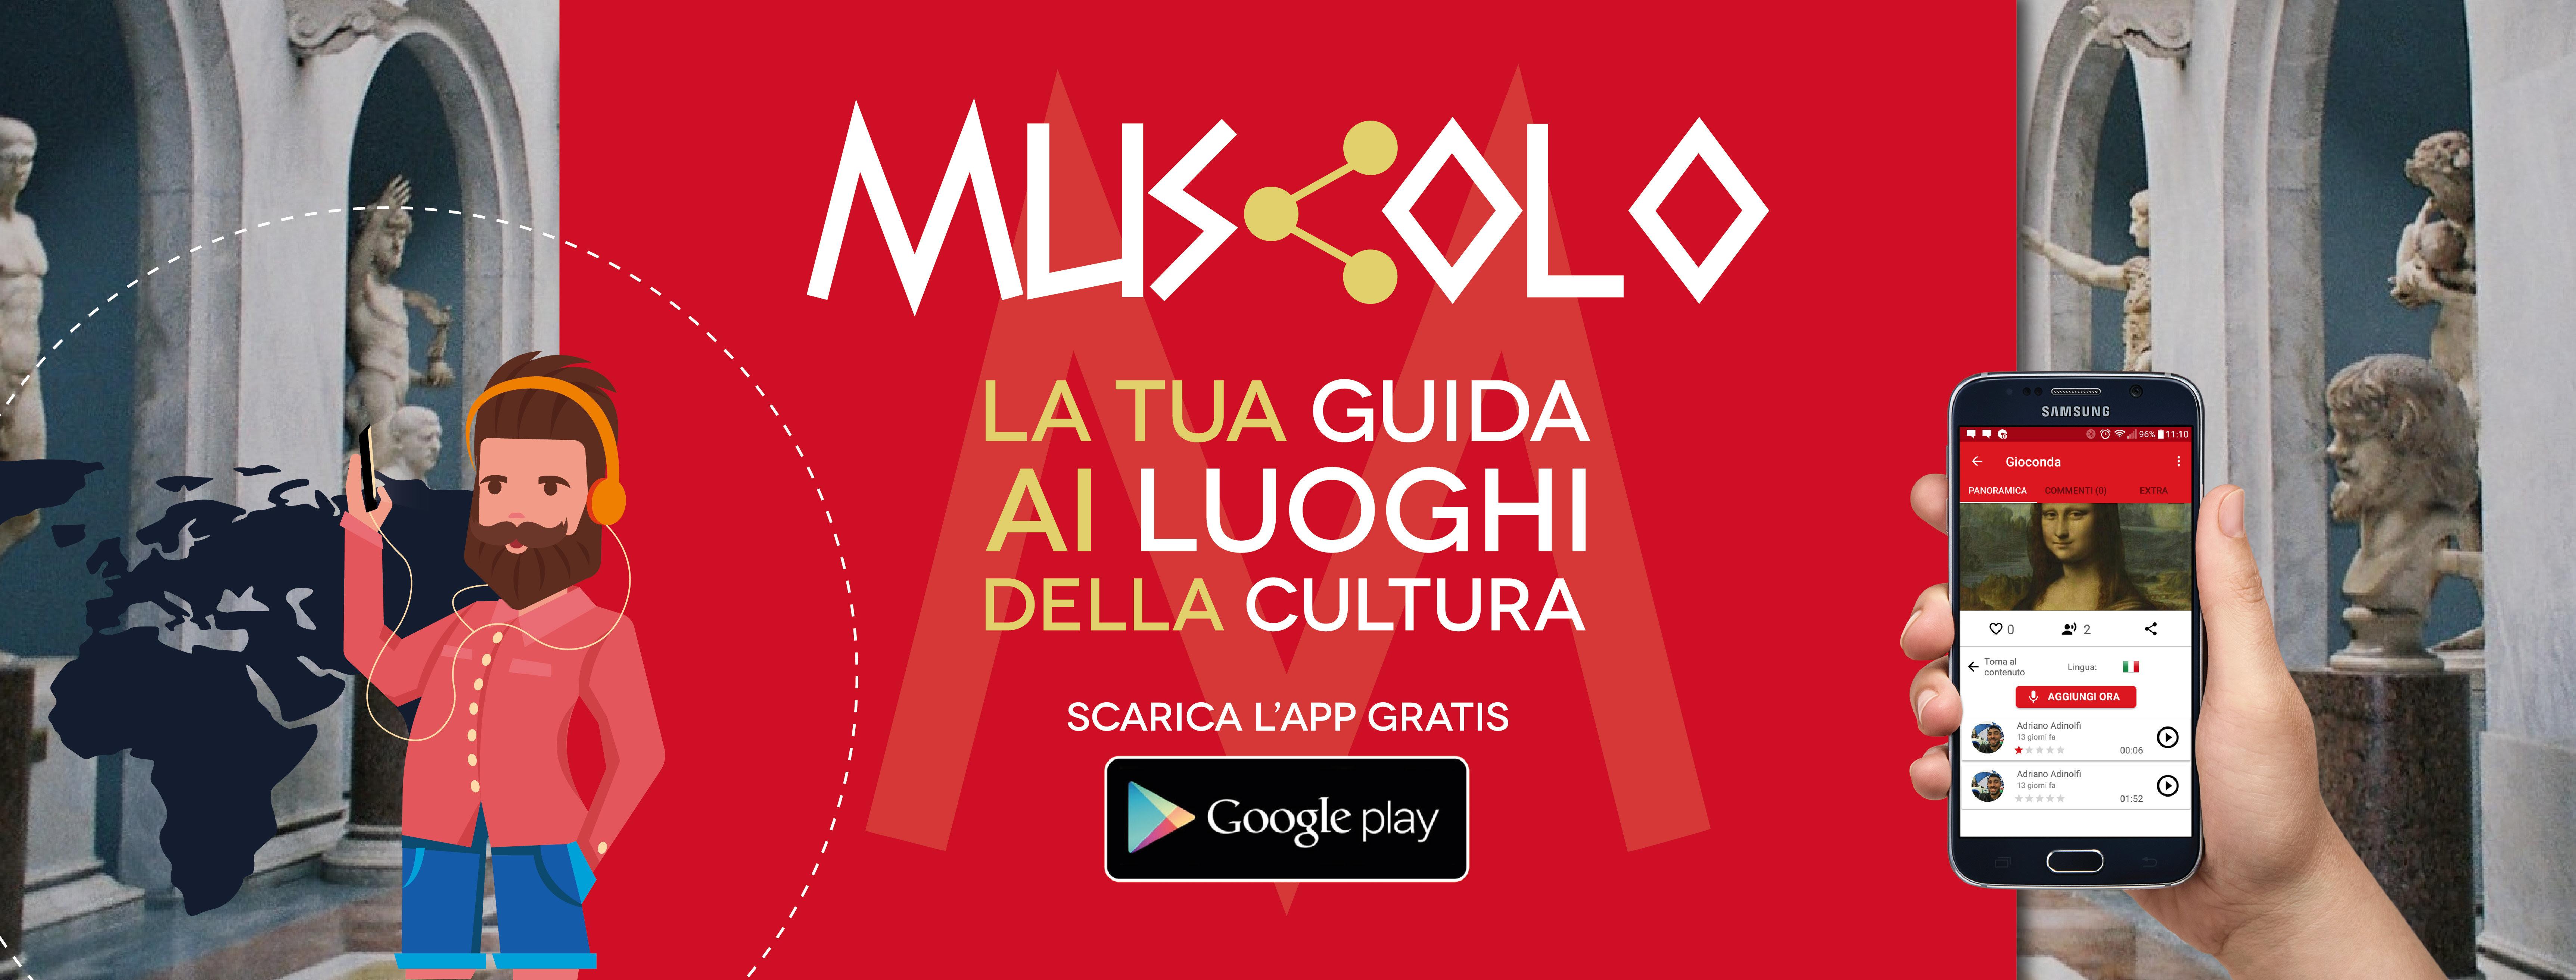 L'app musEolo